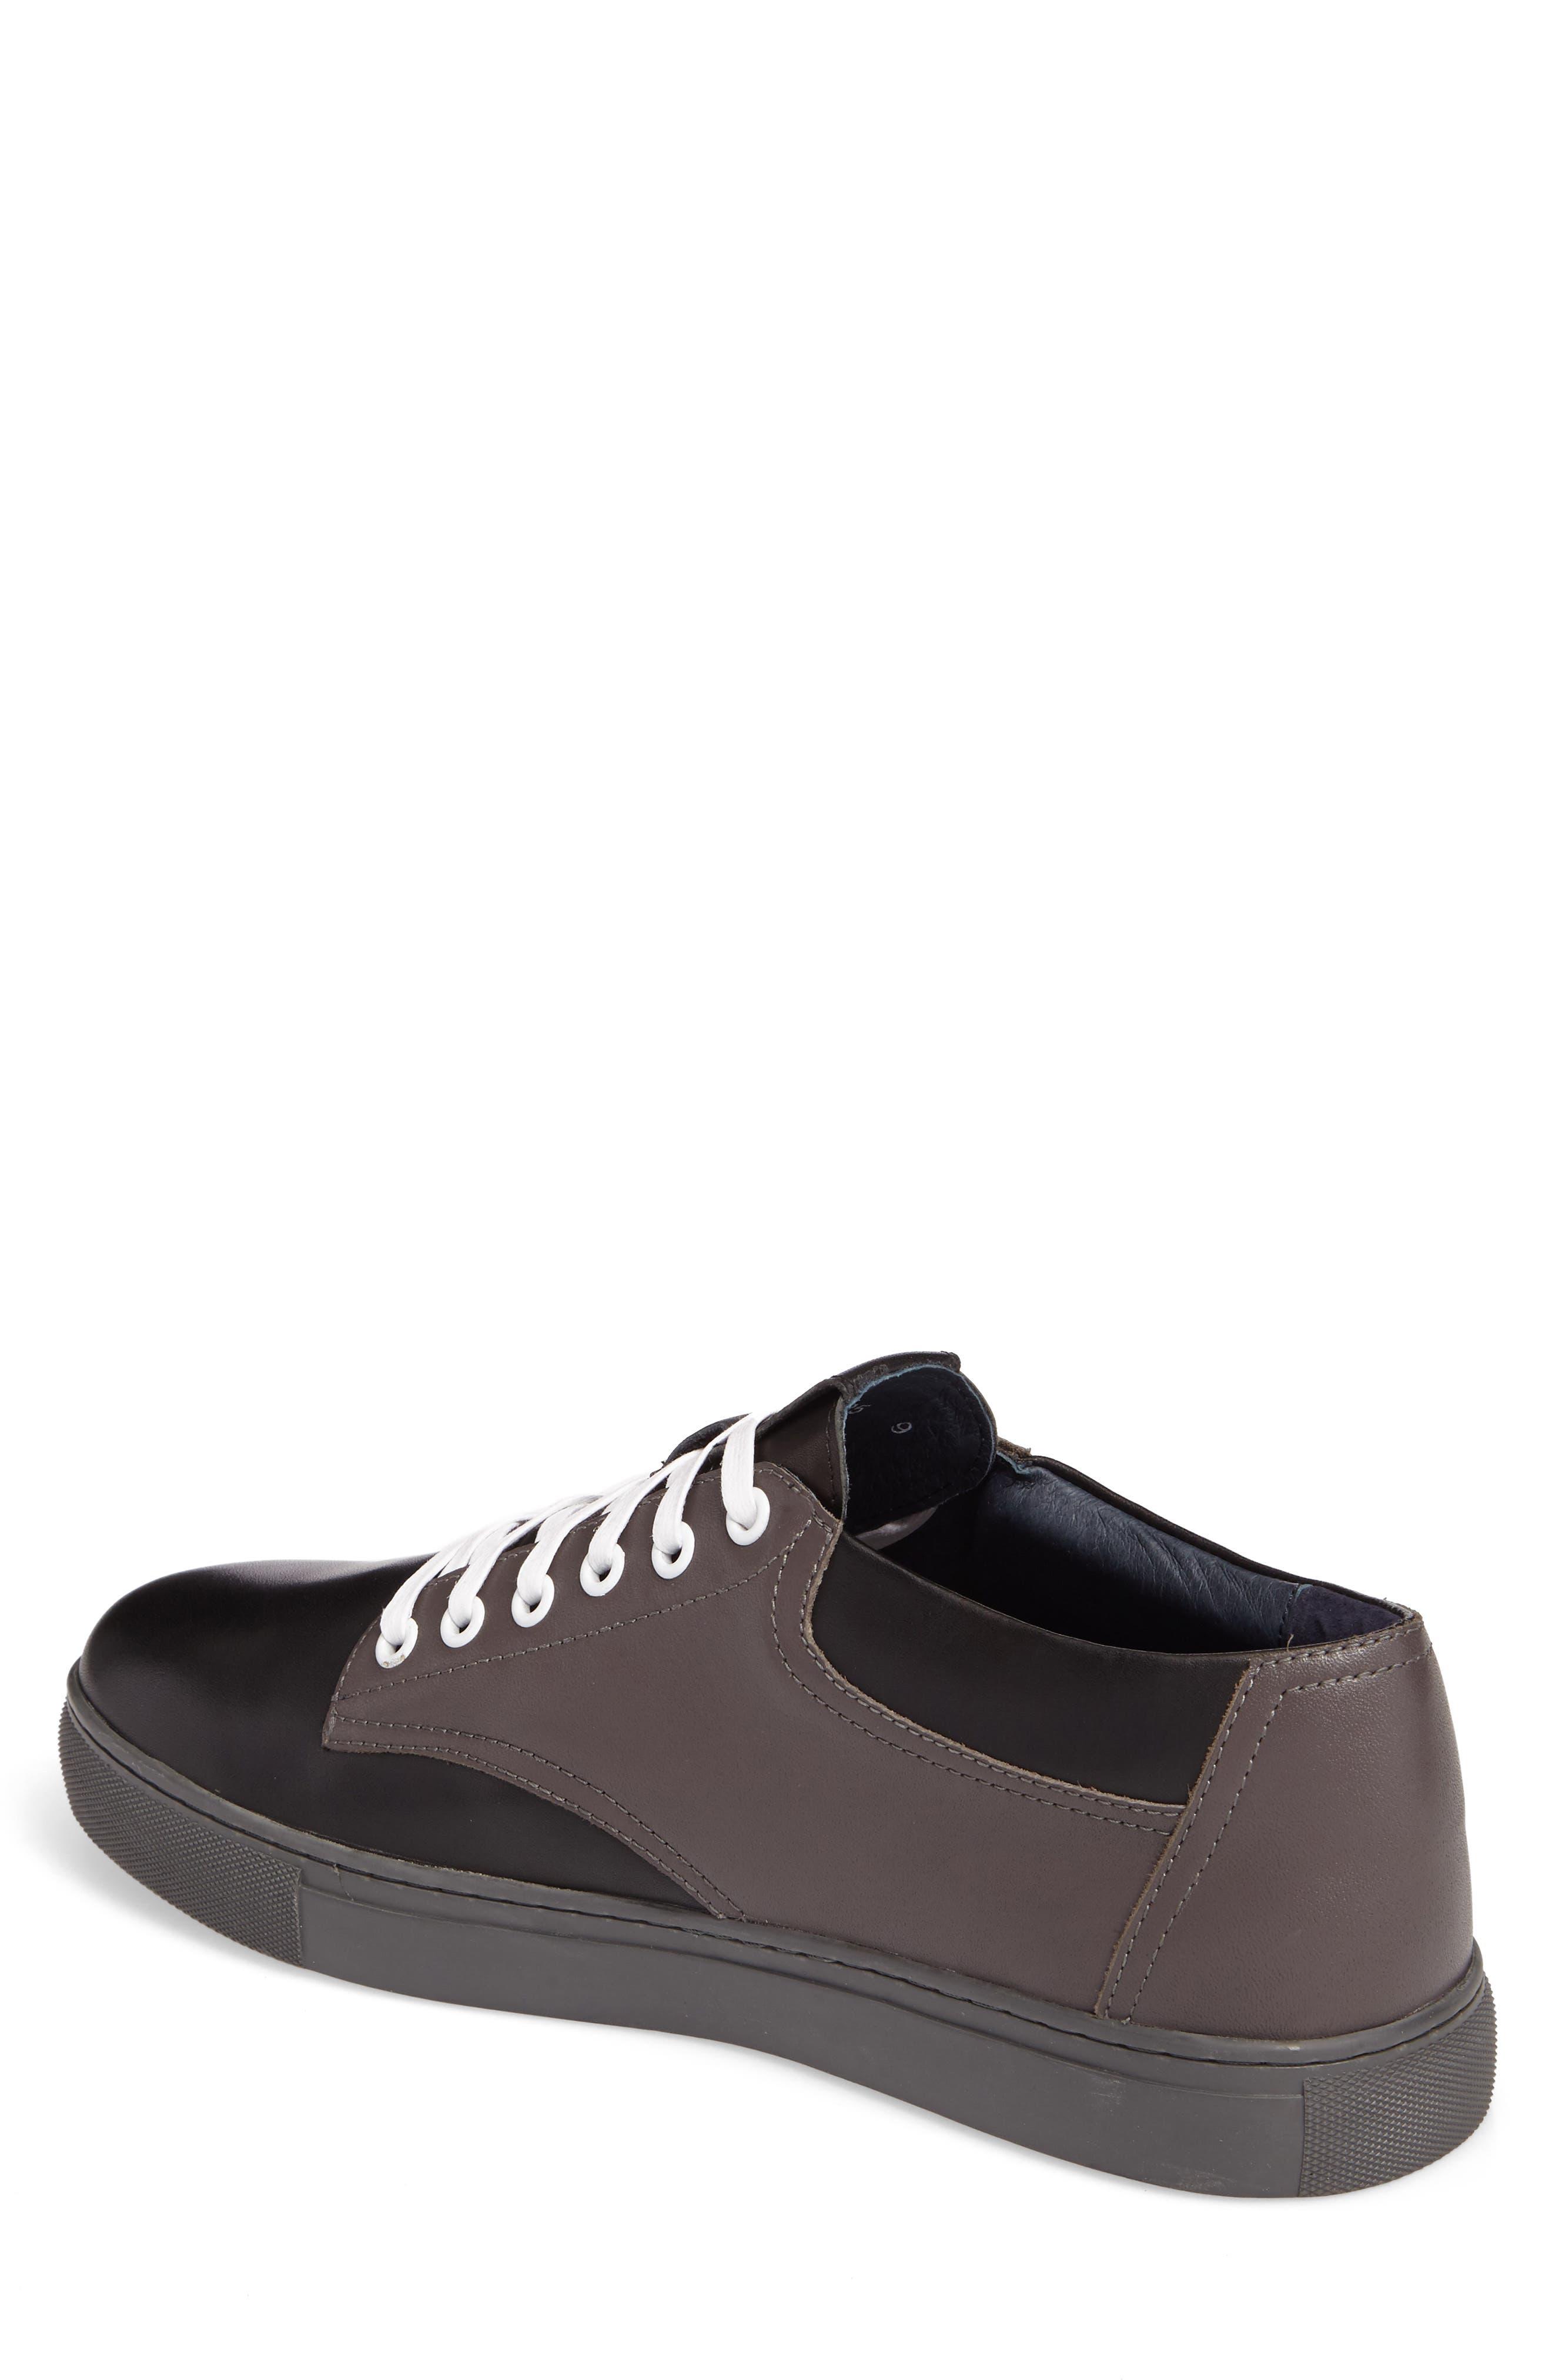 Alternate Image 2  - Zanzara Ralston Sneaker (Men)